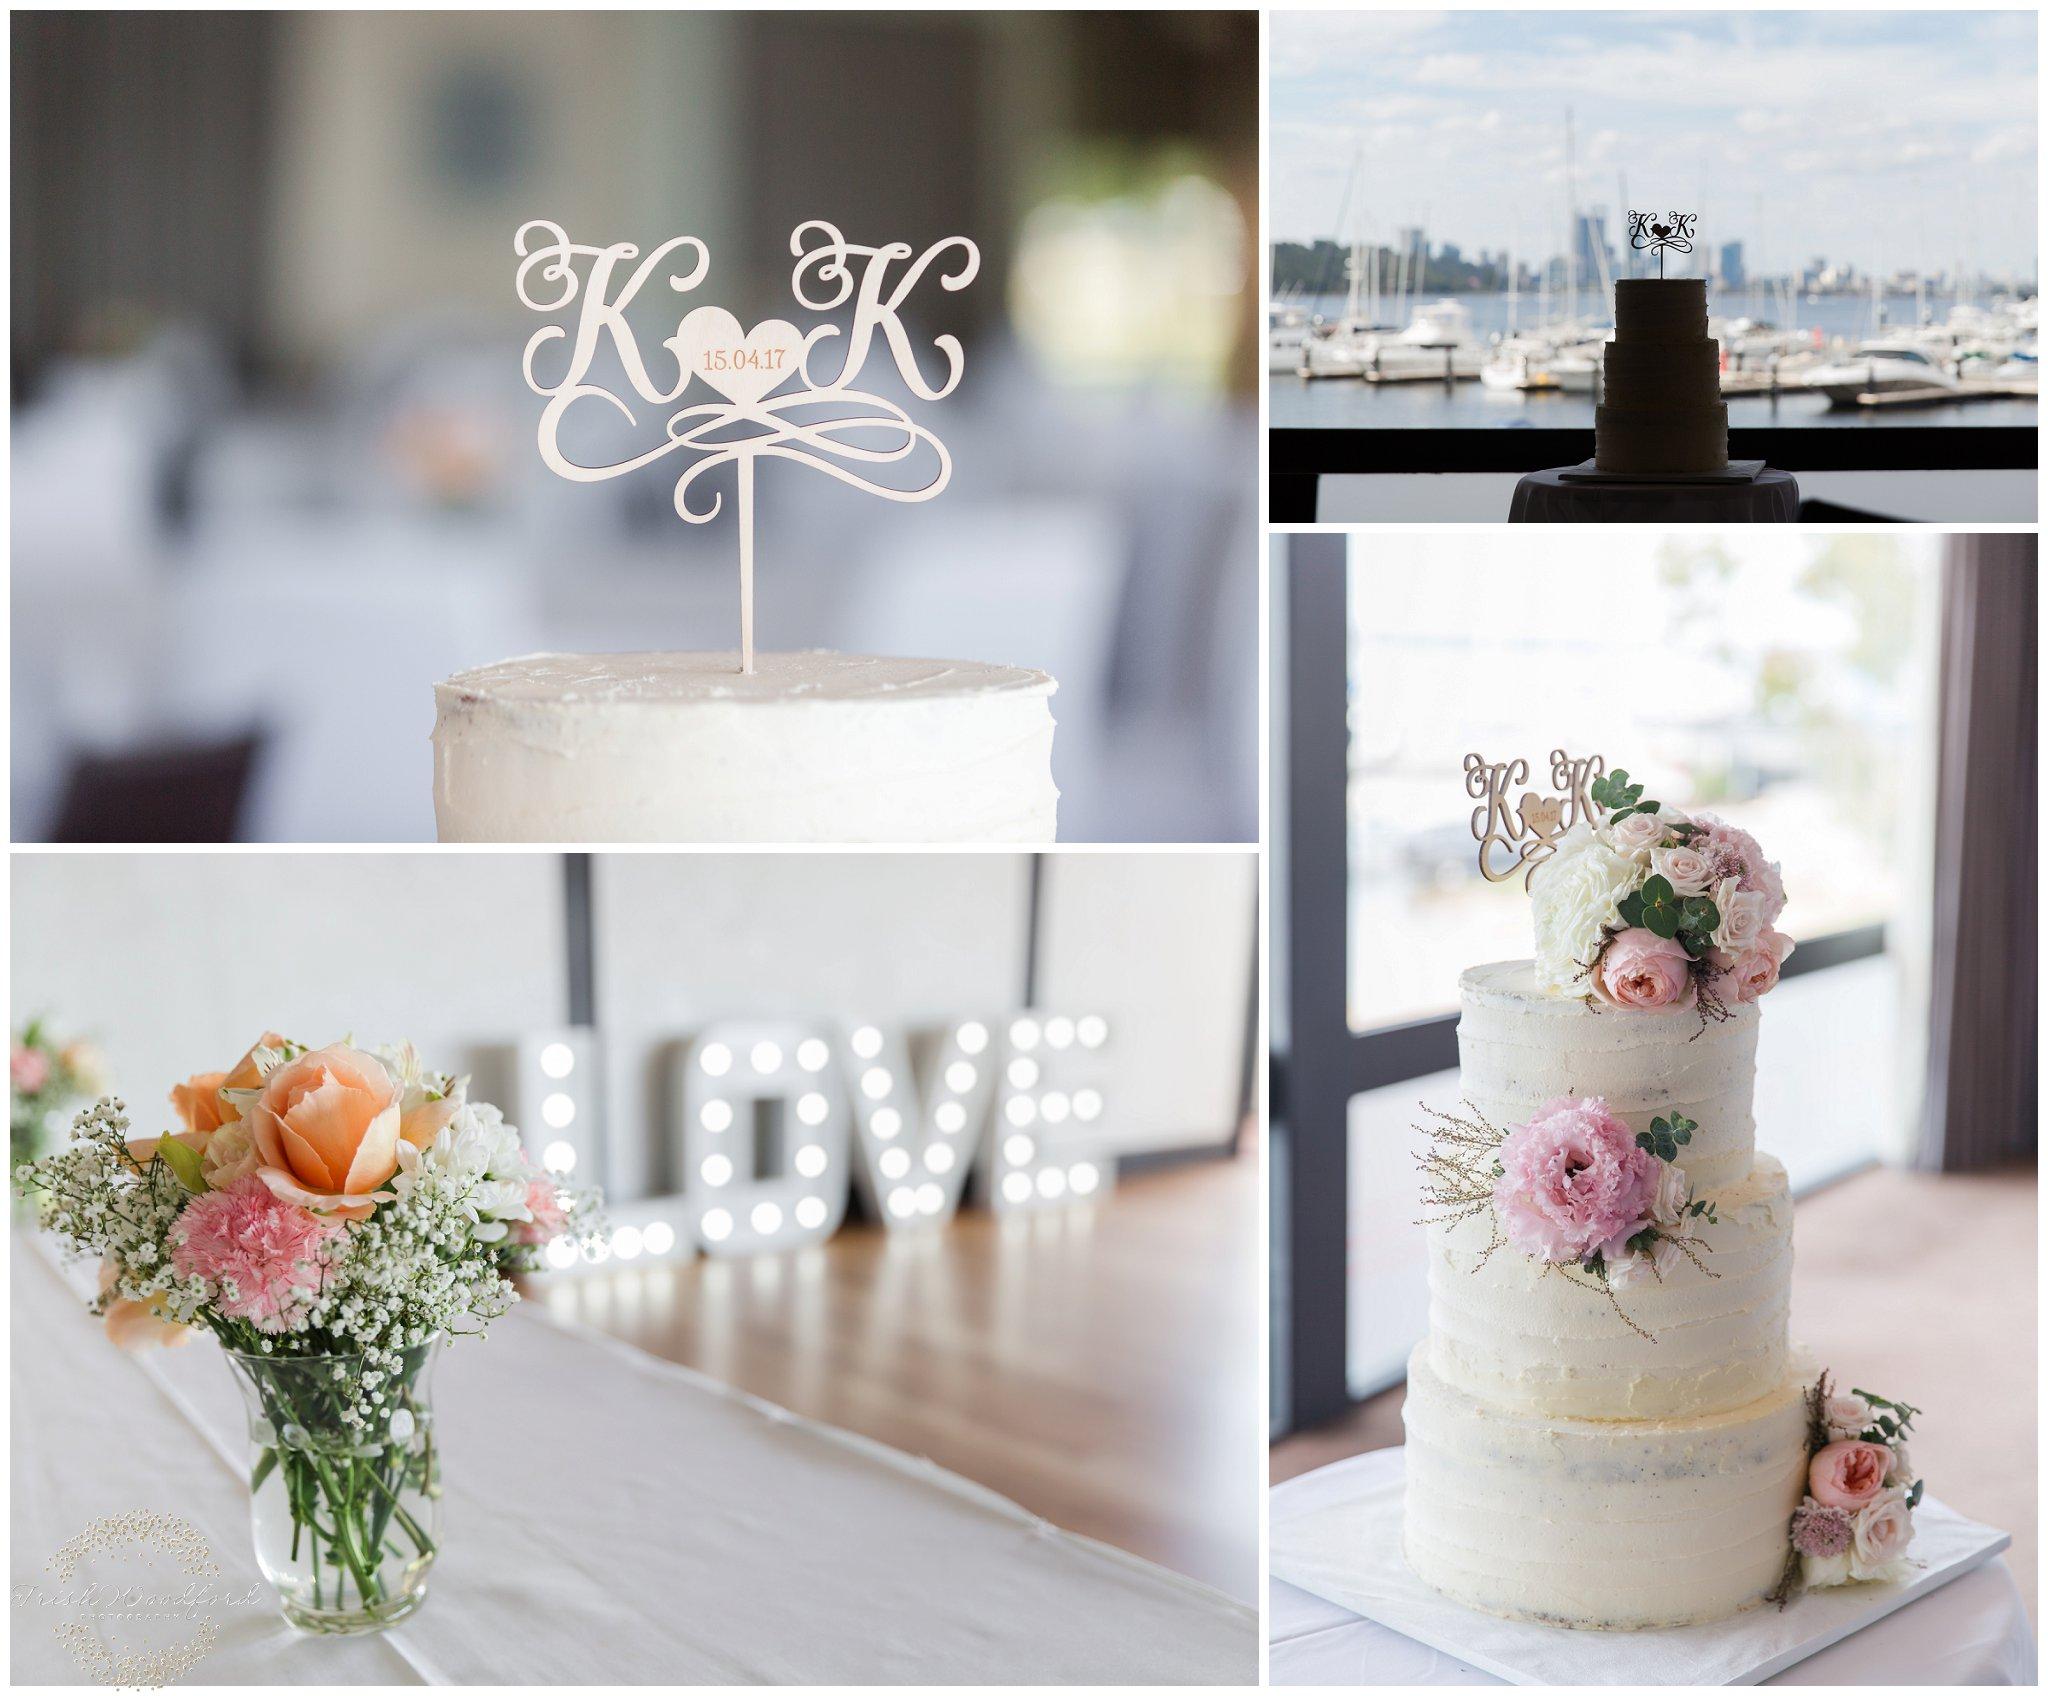 perth wedding details